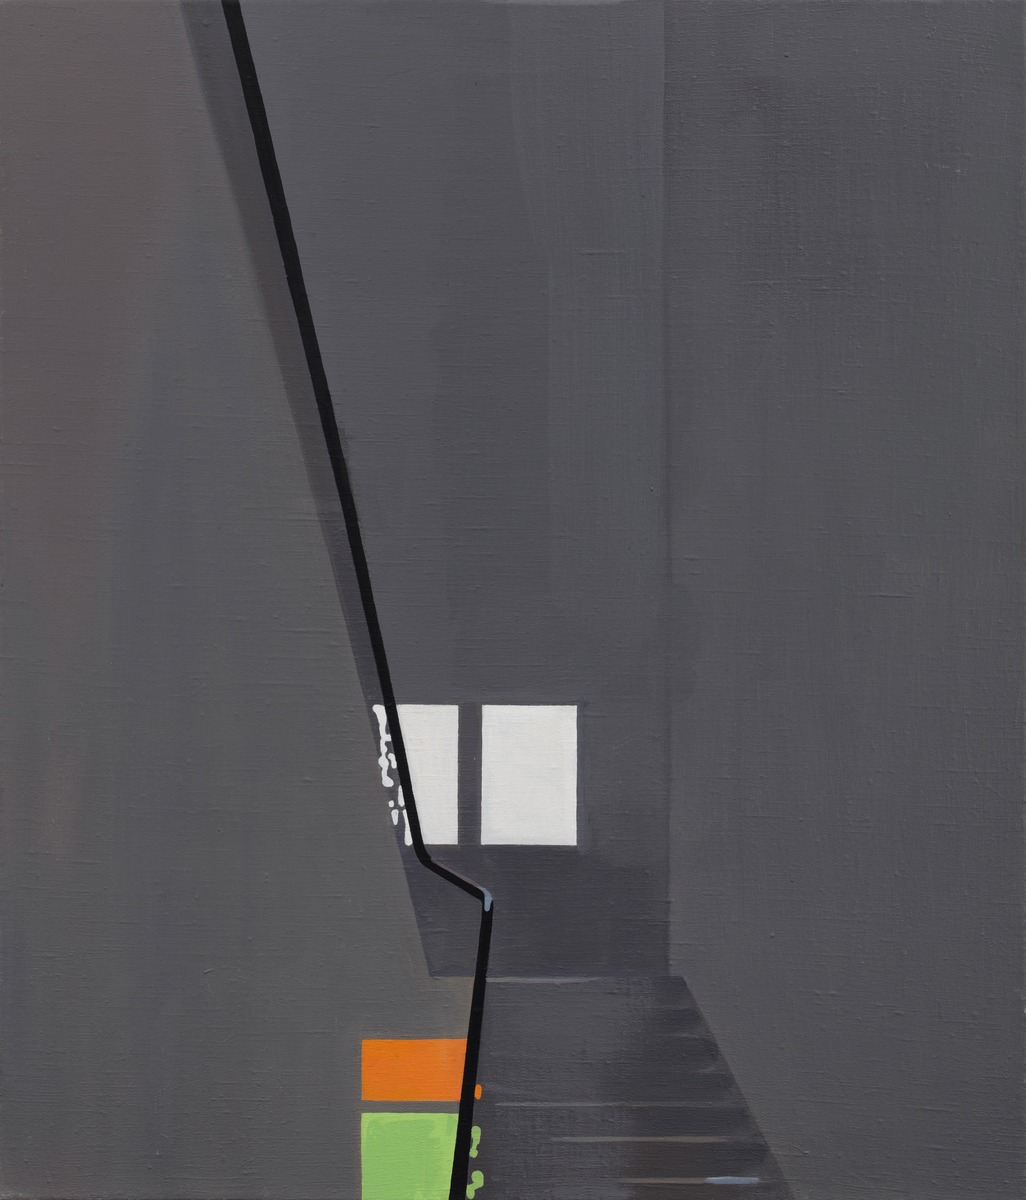 SVIT_Jan Merta_Chodba II (A Corridor II) 2012-2014_olej na plátně_70 x 60 cm